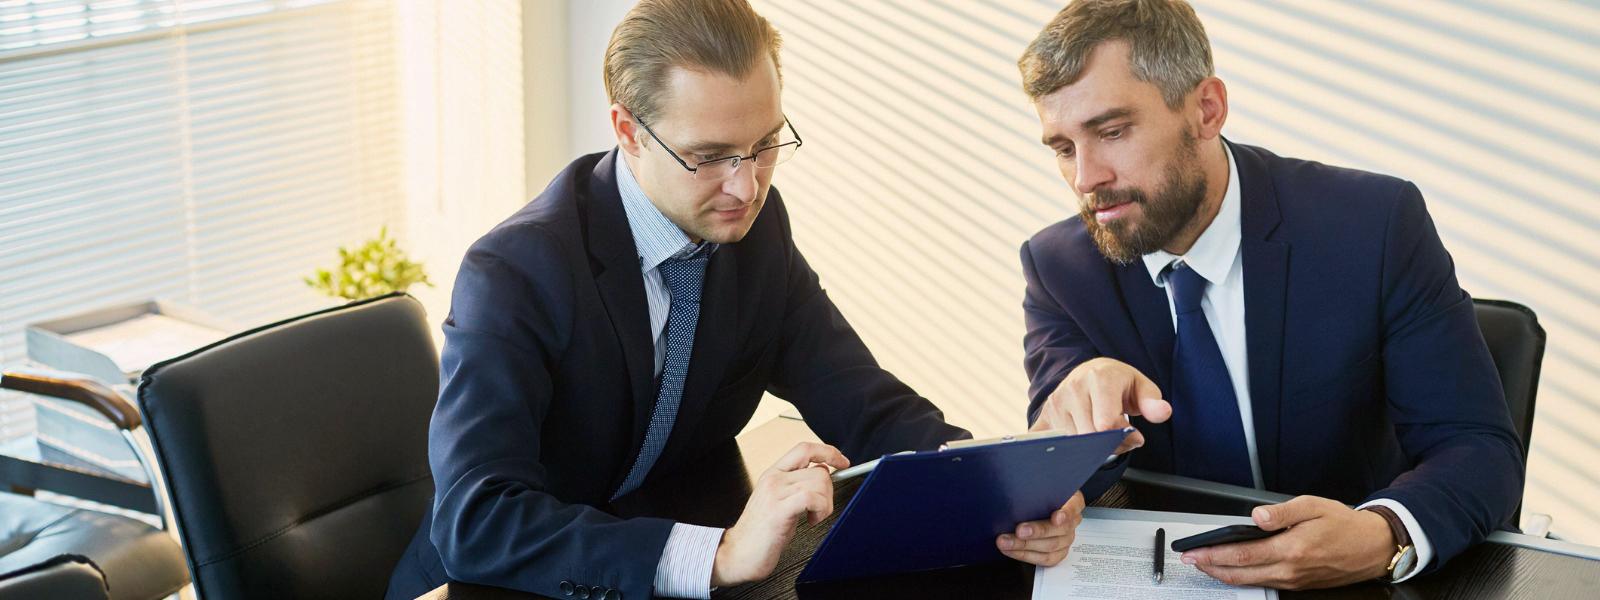 reviewing payroll software